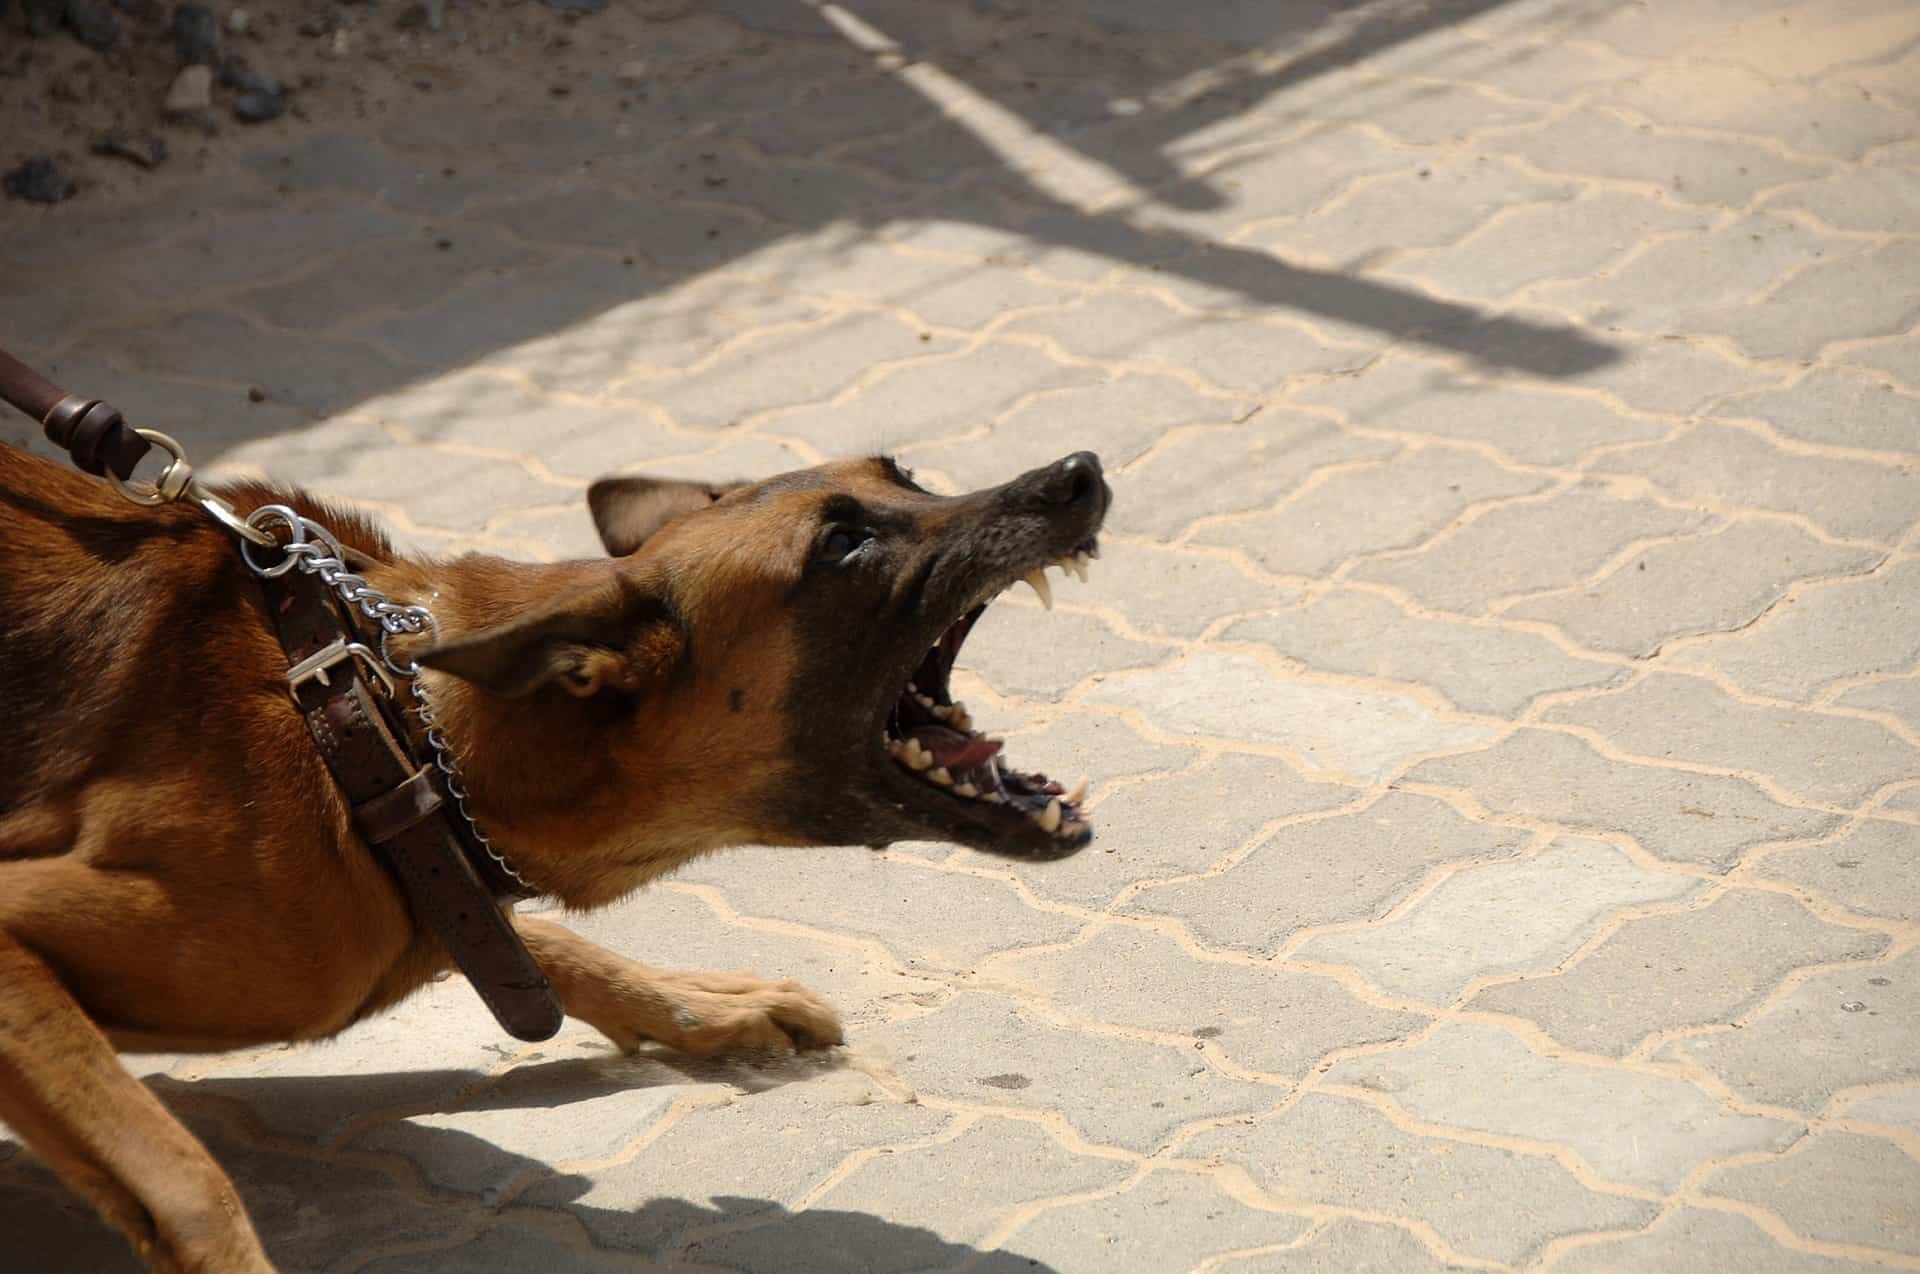 Dog-Bite-Skin-Blood-Personal-Injury-Attorney-Scar-Pain-Pitbull-German-Sheppard-Pit-Doberman-Agressive-No-Leash-Collar-Face-Scarring-Pain-Sue-Money-Court